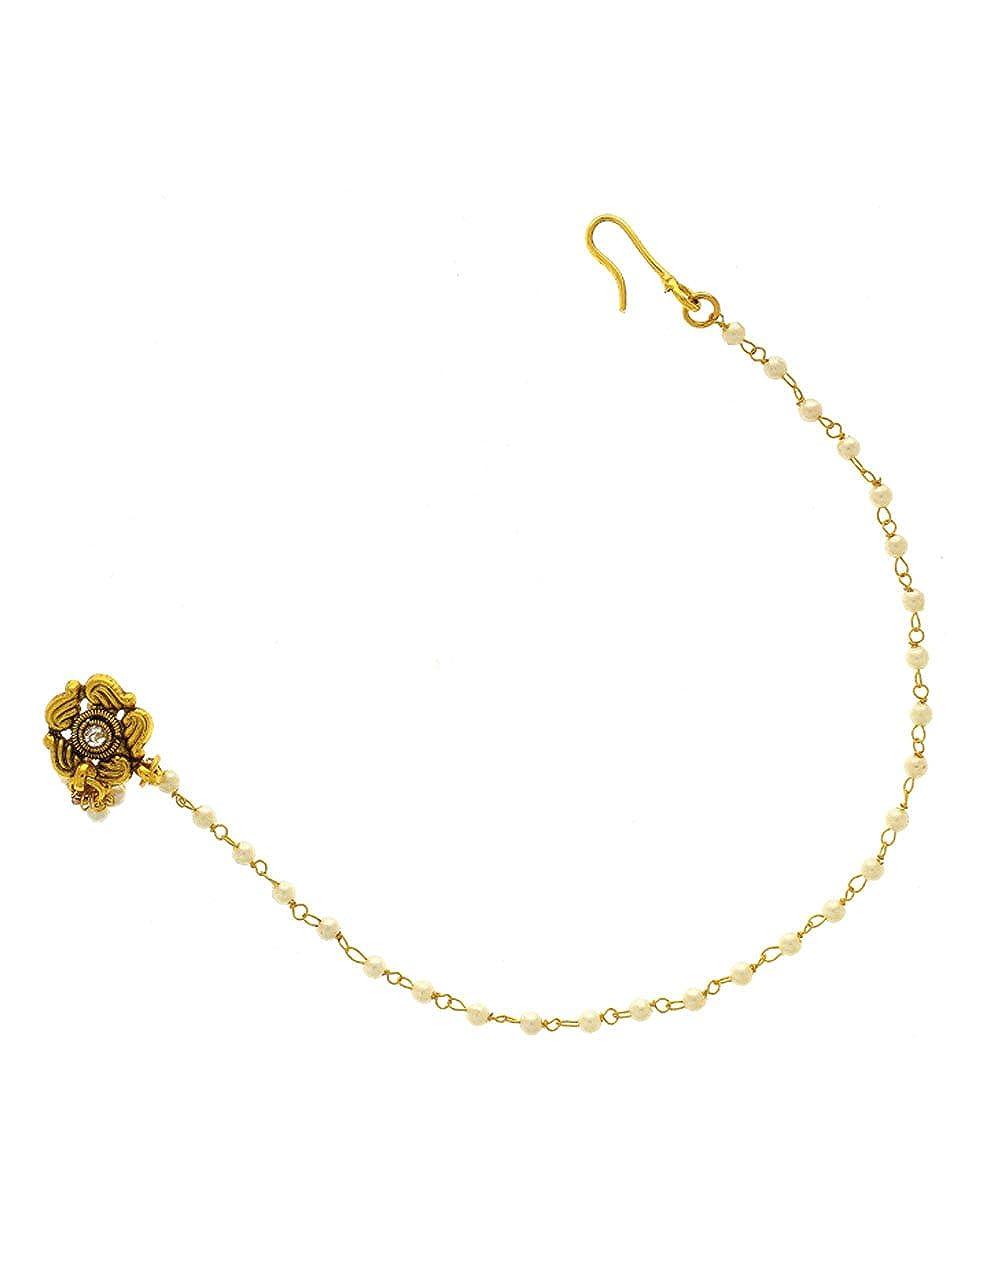 Buy Anuradha Art Golden Finish Simple Classy Traditional Studs